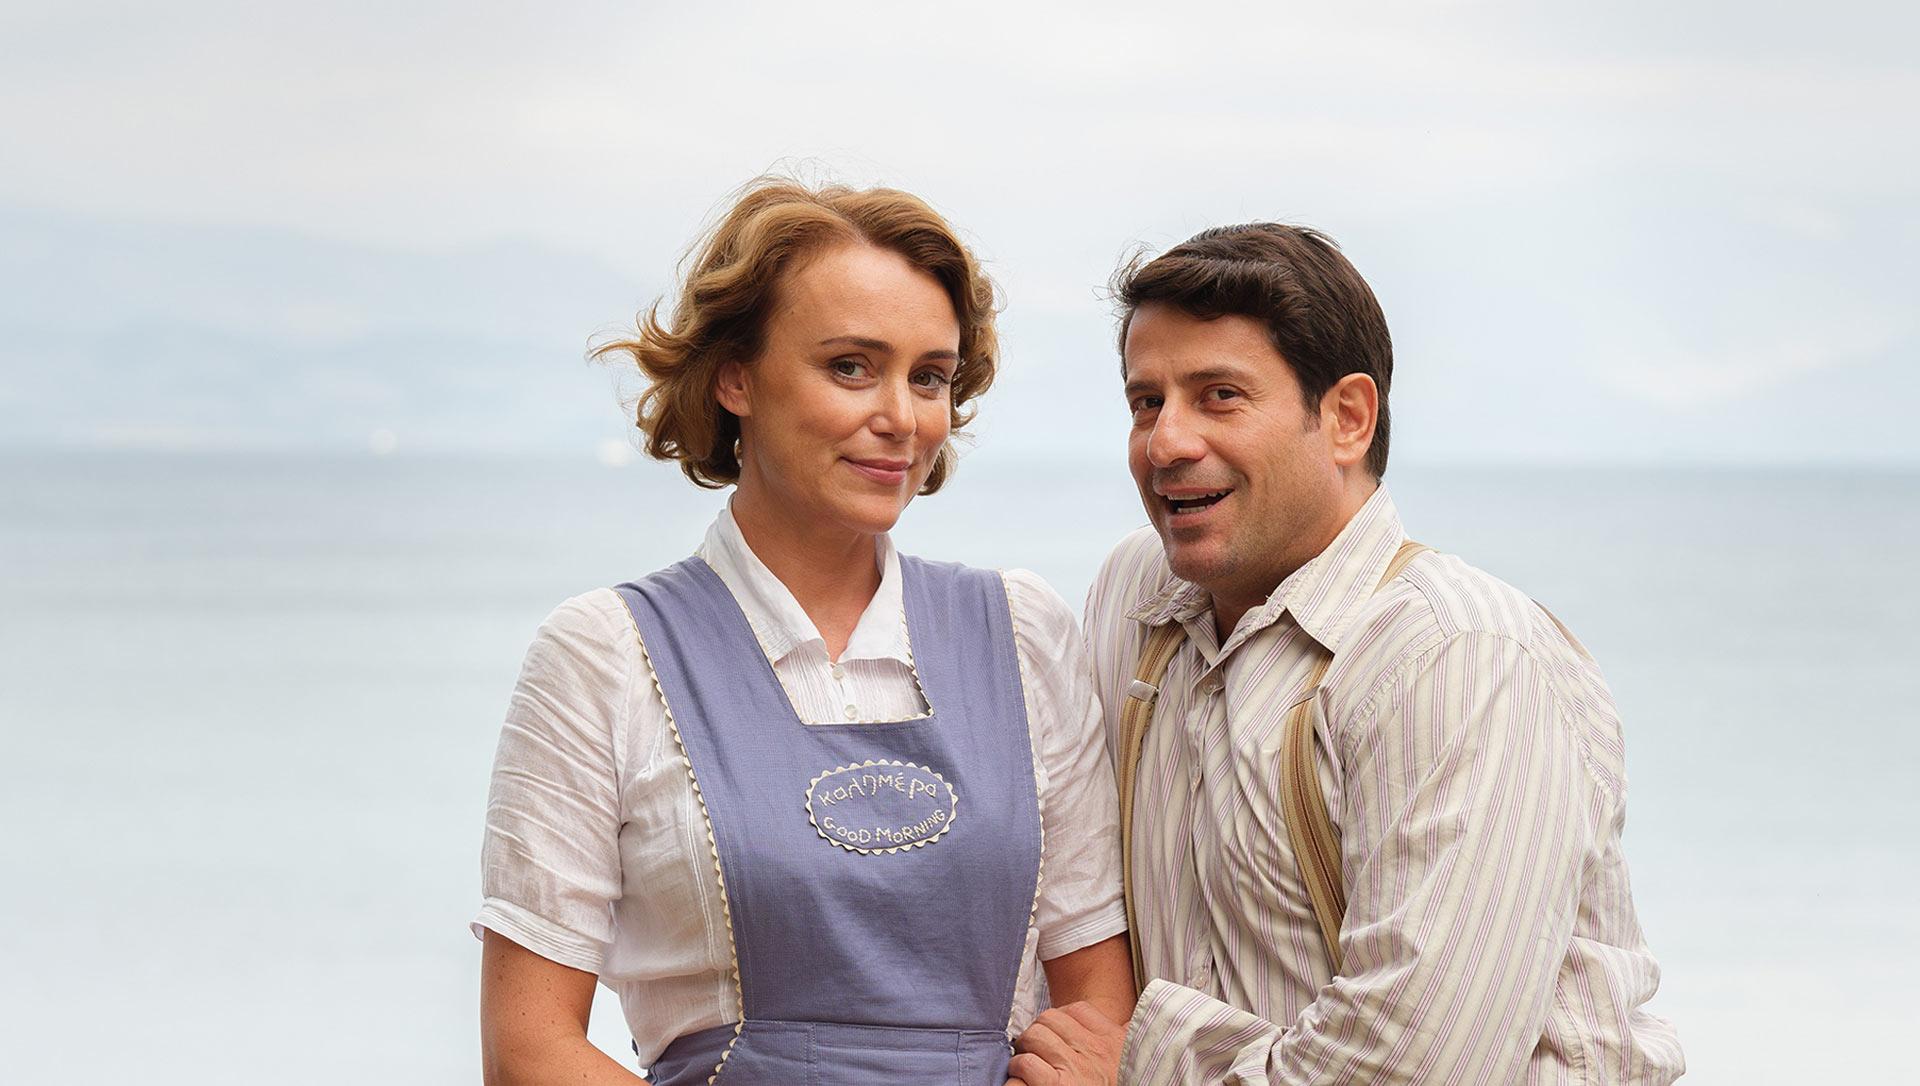 Louisa Durrell (KEELEY HAWES) & Spiro (ALEXIS GEORGOULIS)